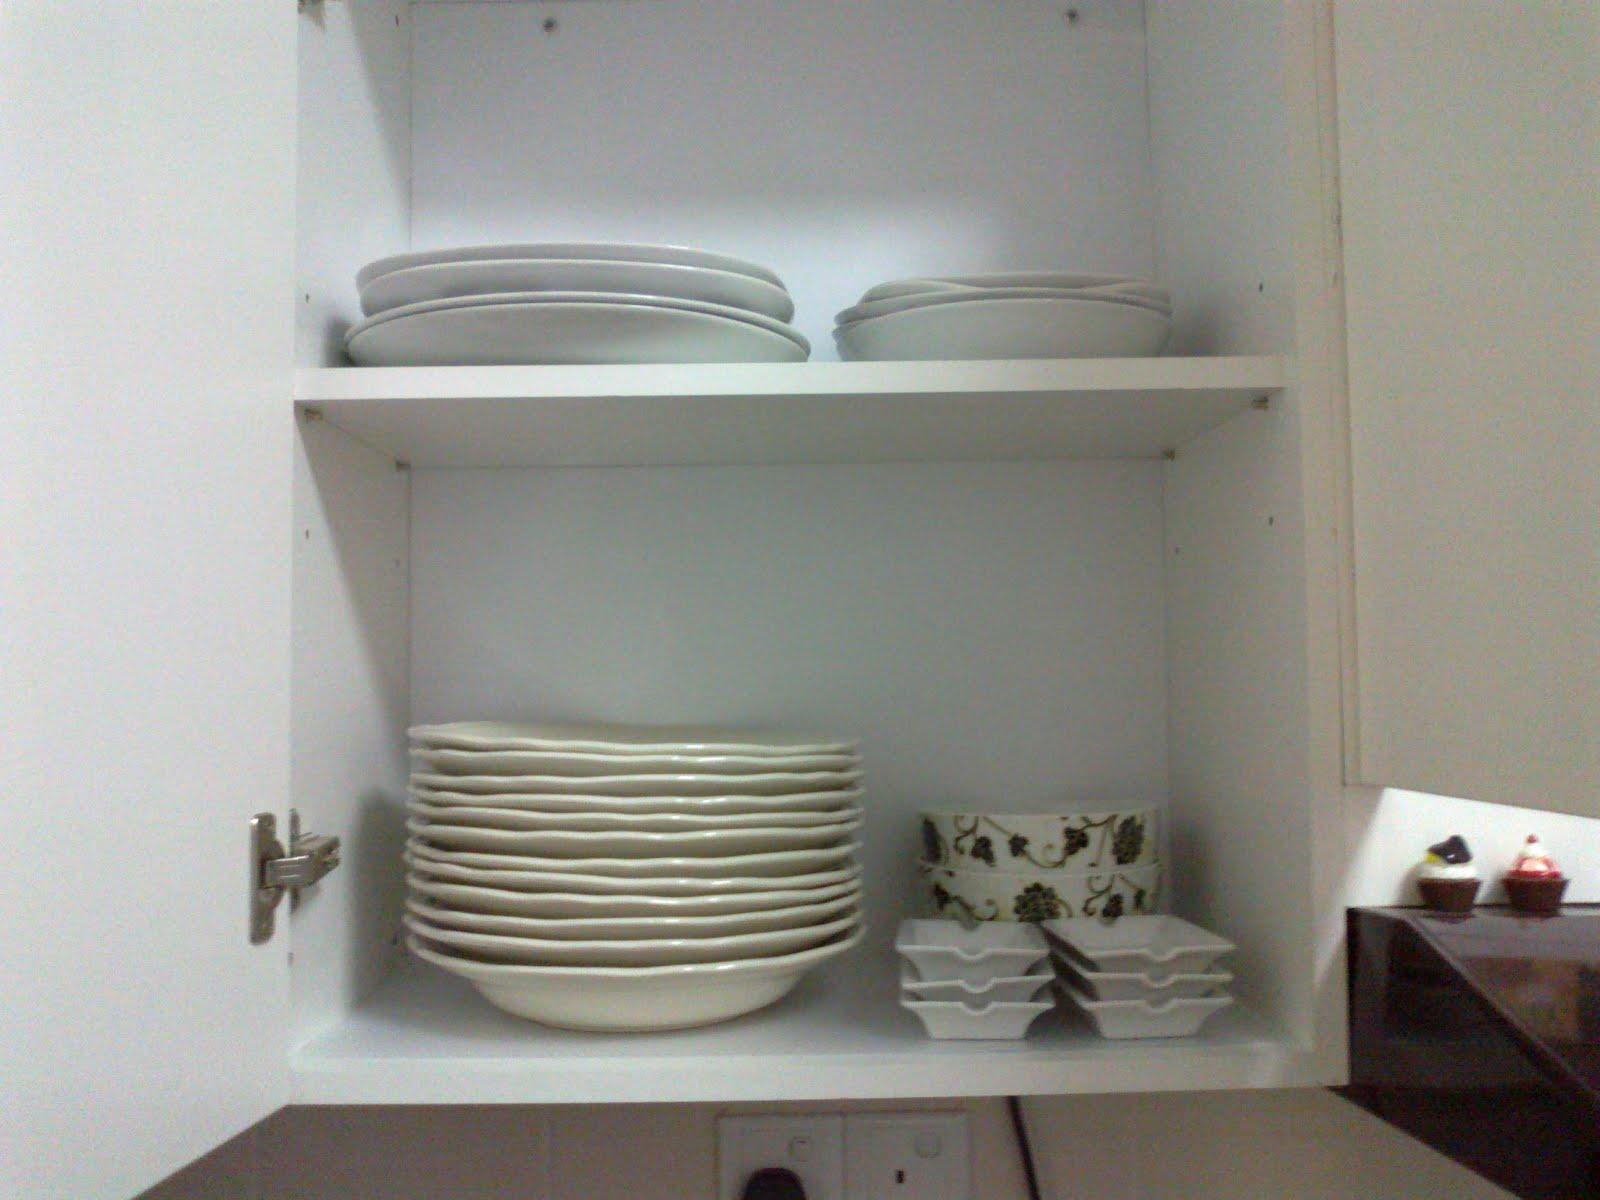 Rumah Kami, Syurga Kami: Mengorganisasikan Kabinet Dapur